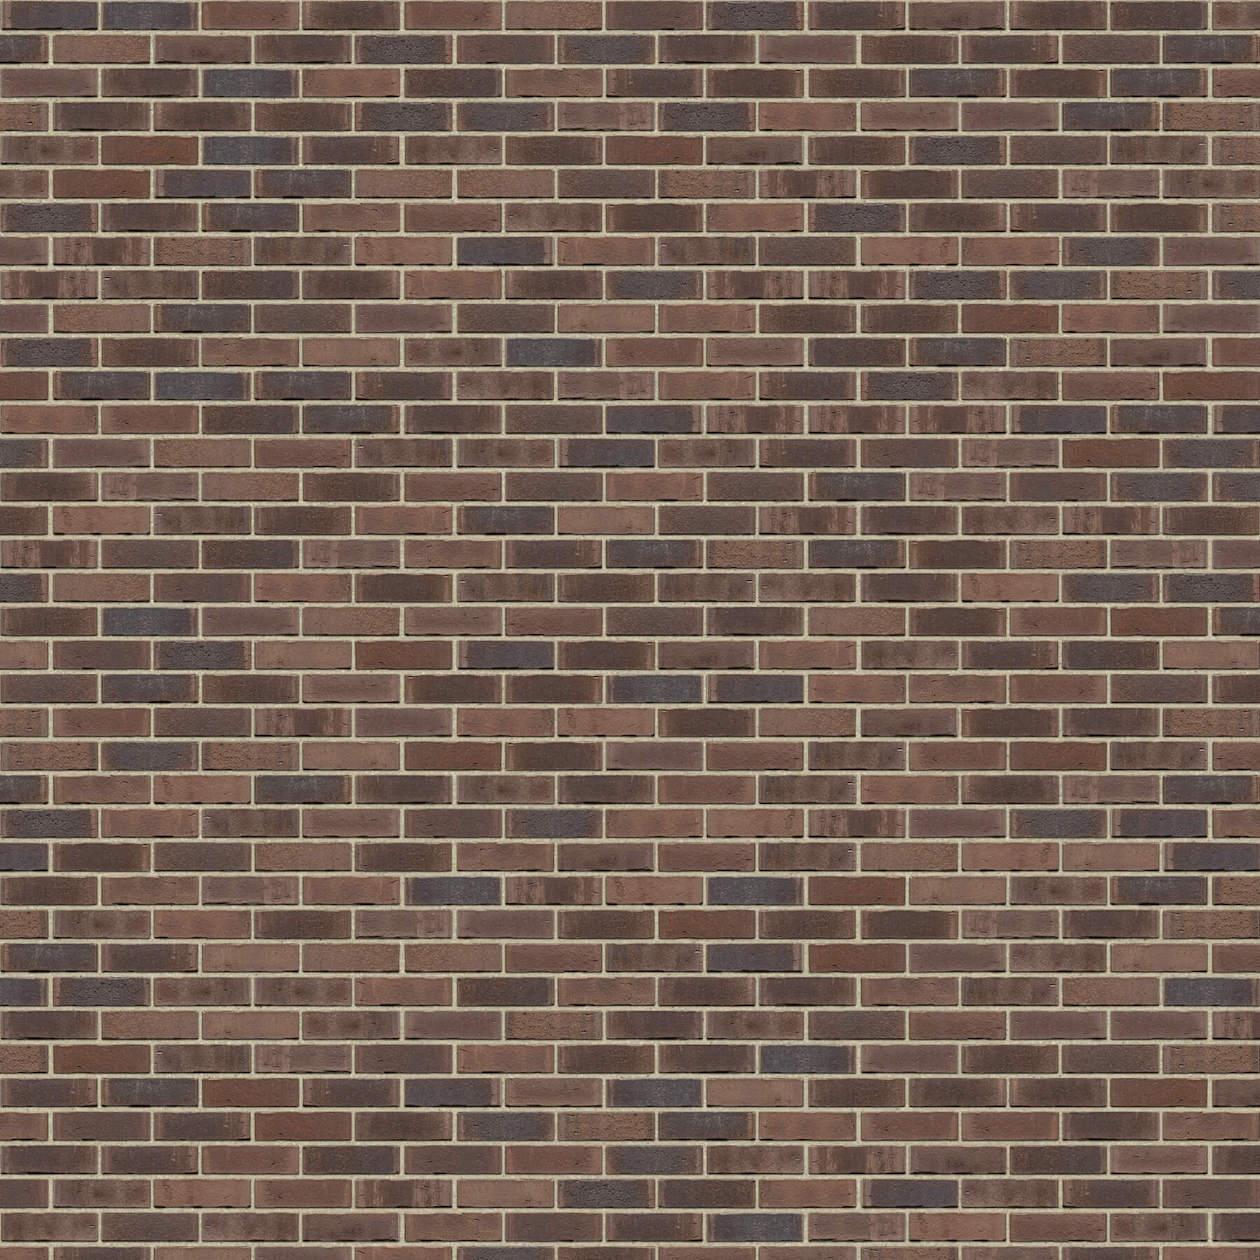 Puna-cigla-FeldHaus-Klinker-brick-house-nf-k-745-Bez Fuga